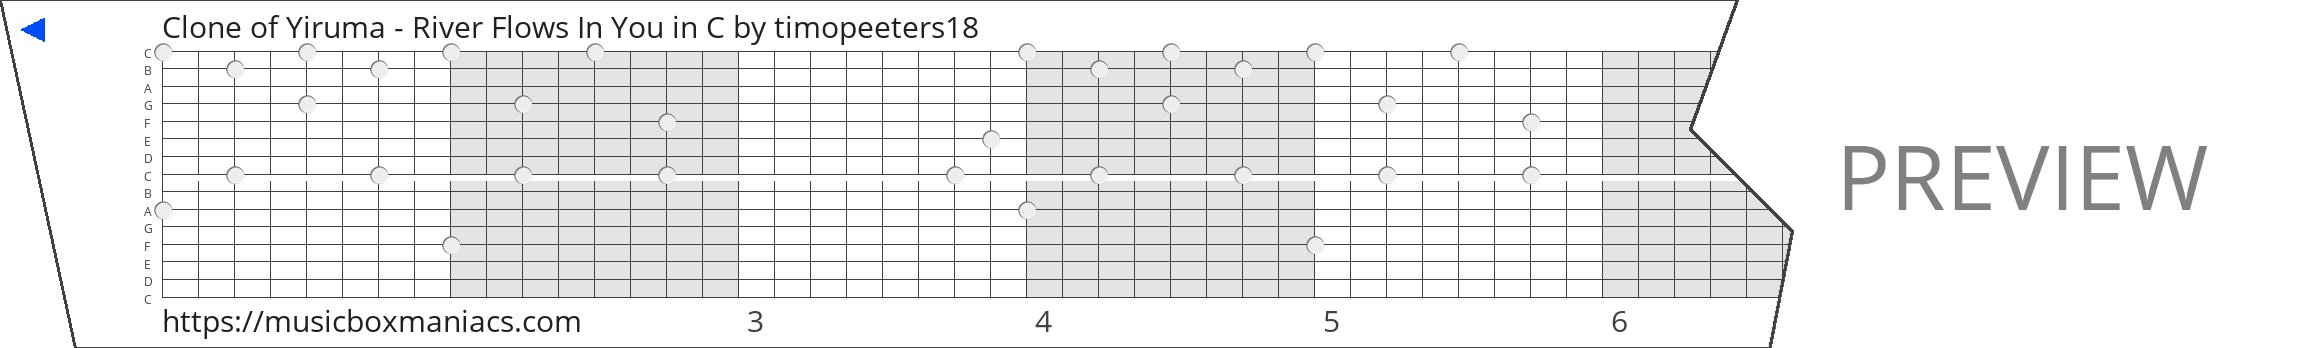 Clone of Yiruma - River Flows In You in C 15 note music box paper strip